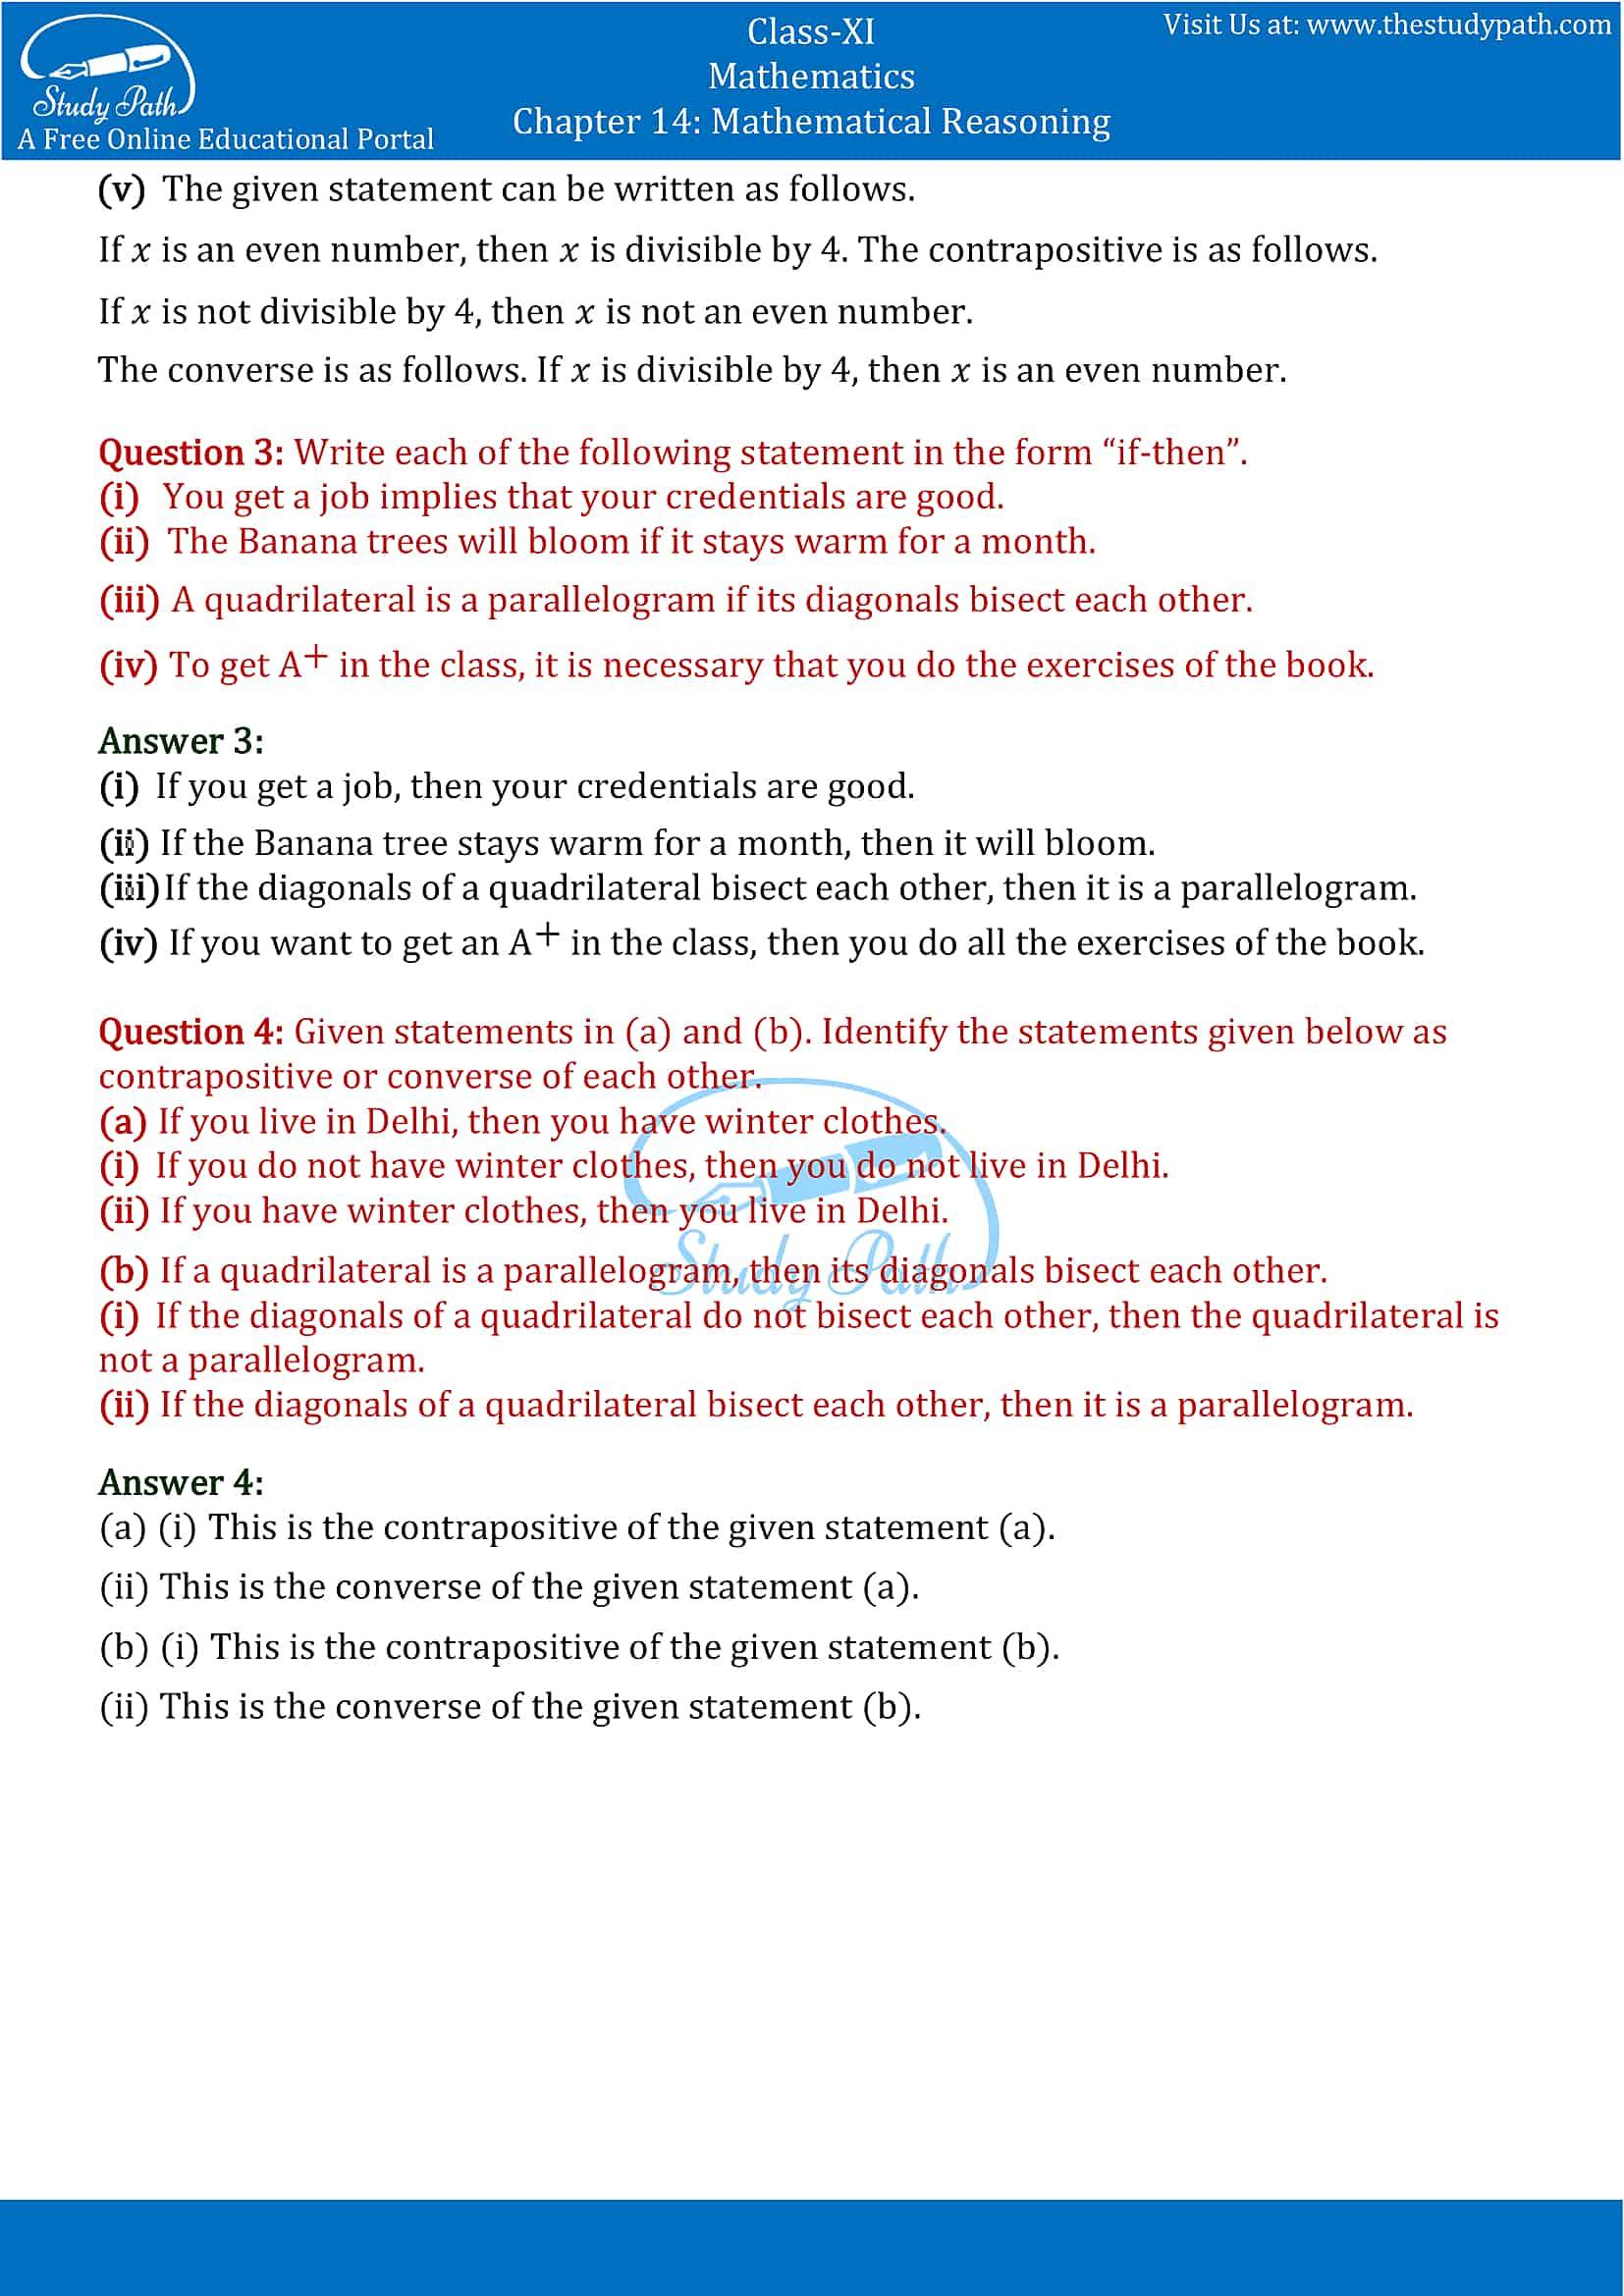 NCERT Solutions for Class 11 Maths Chapter 14 Mathematical Reasoning Part 8